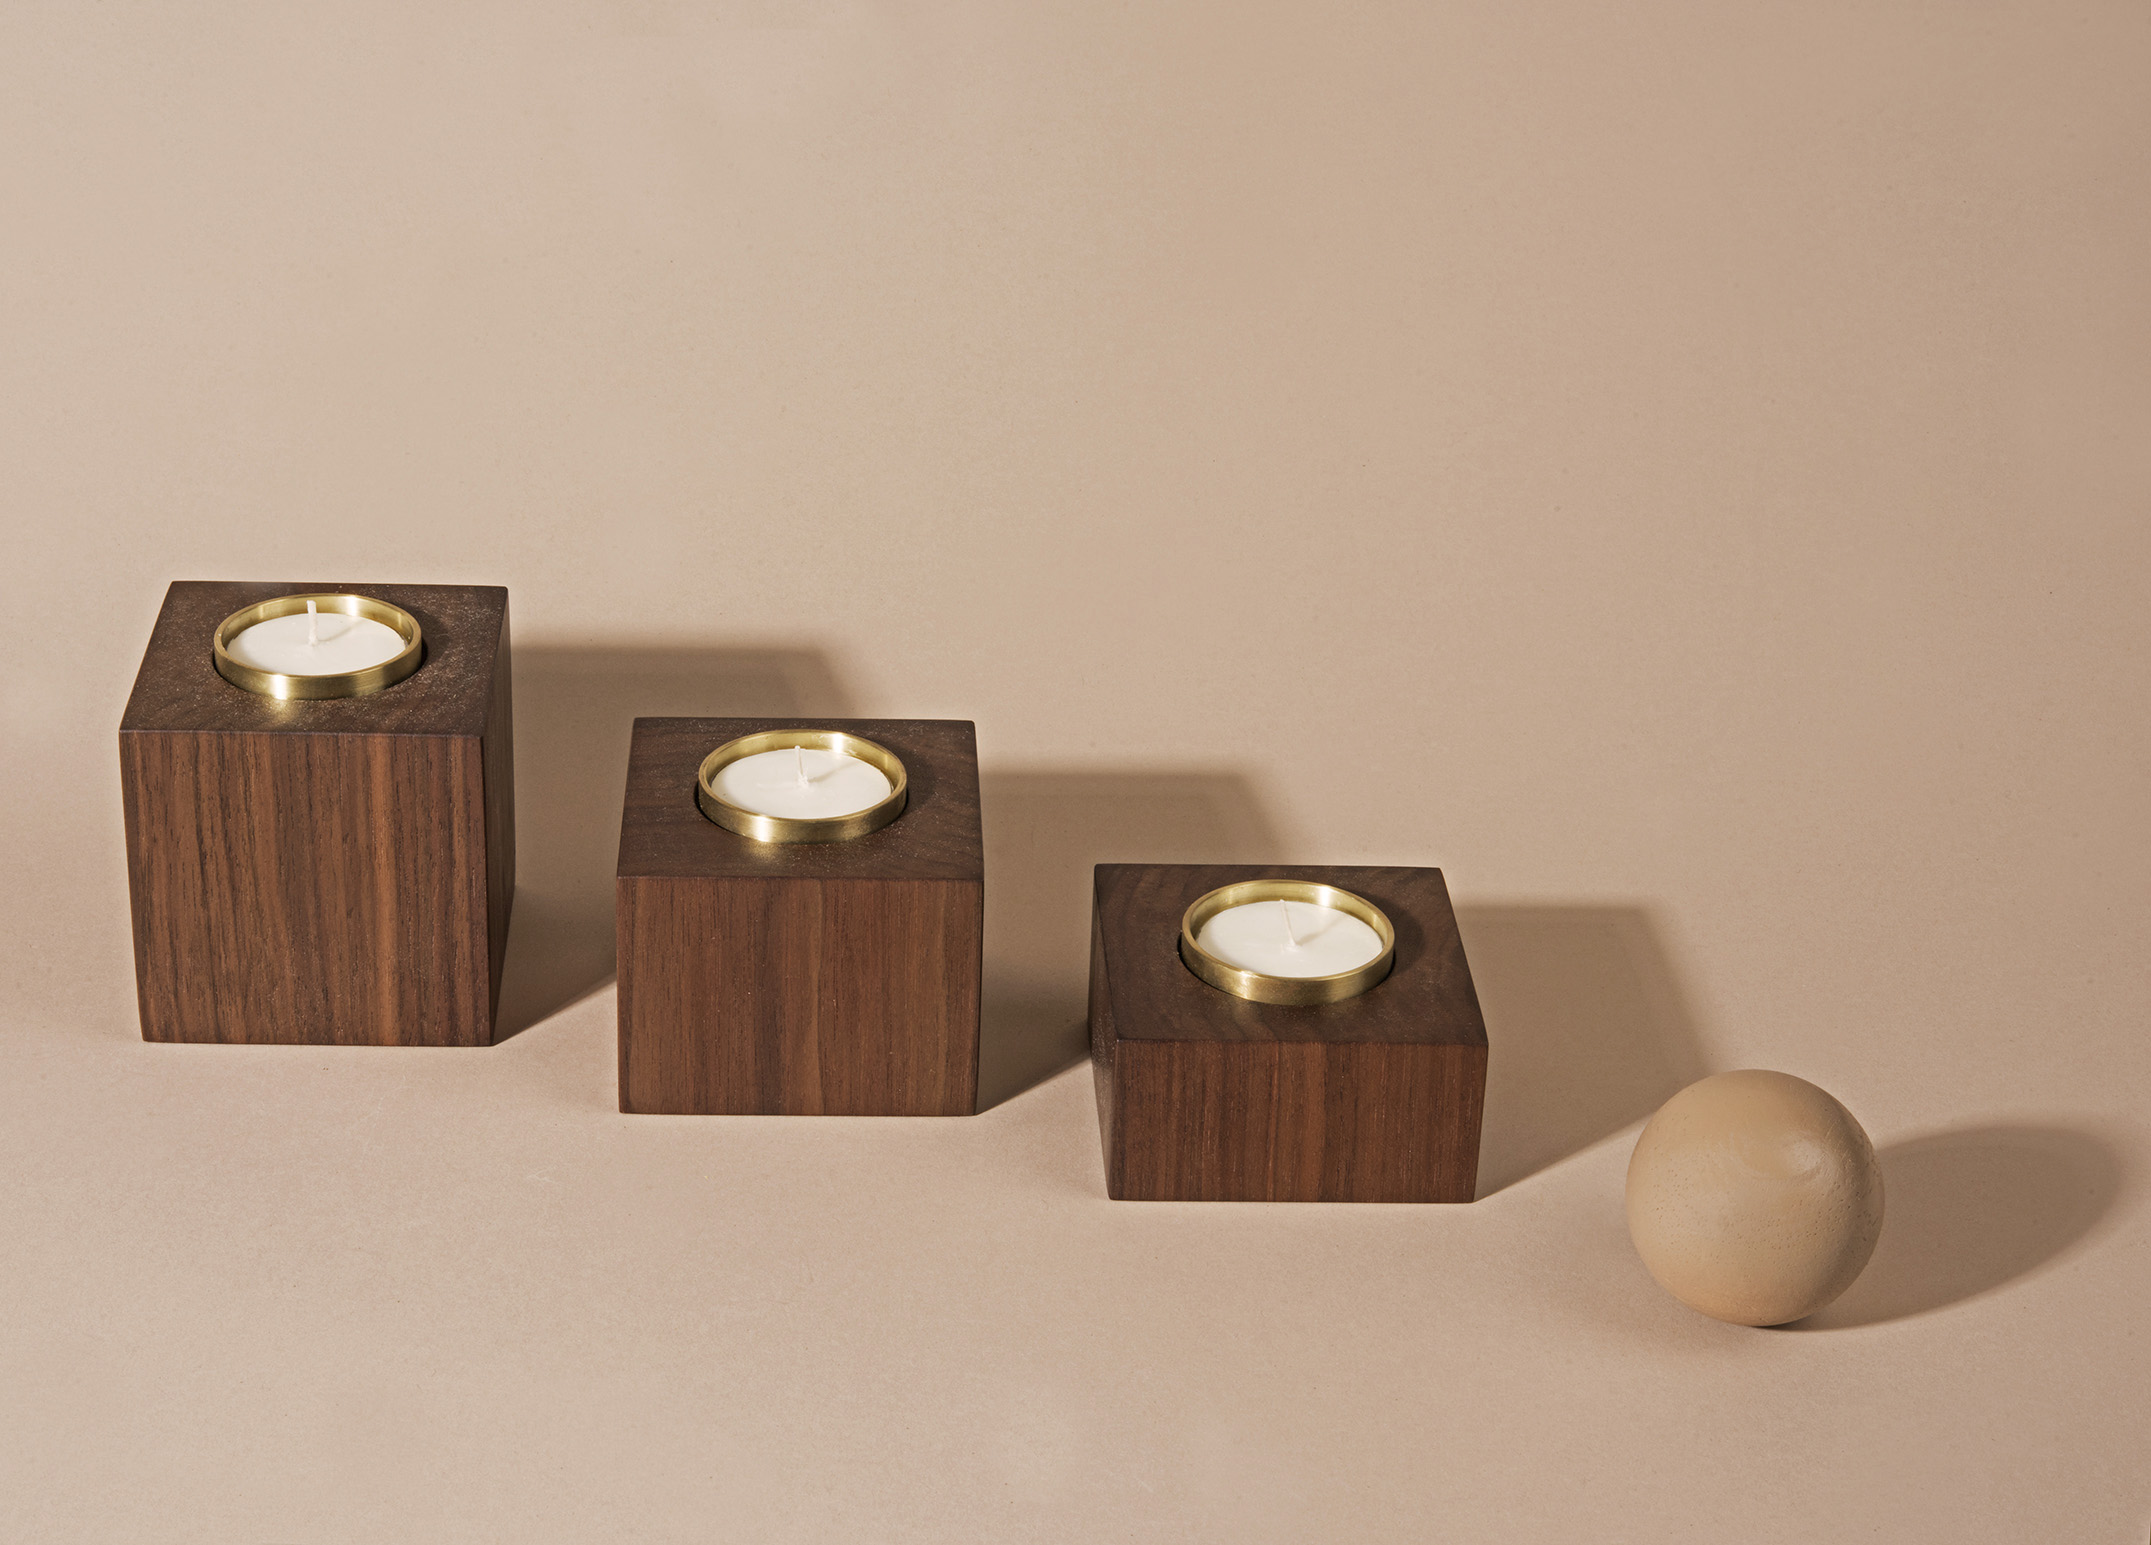 MARMOL RADZINER  tealight candle set.